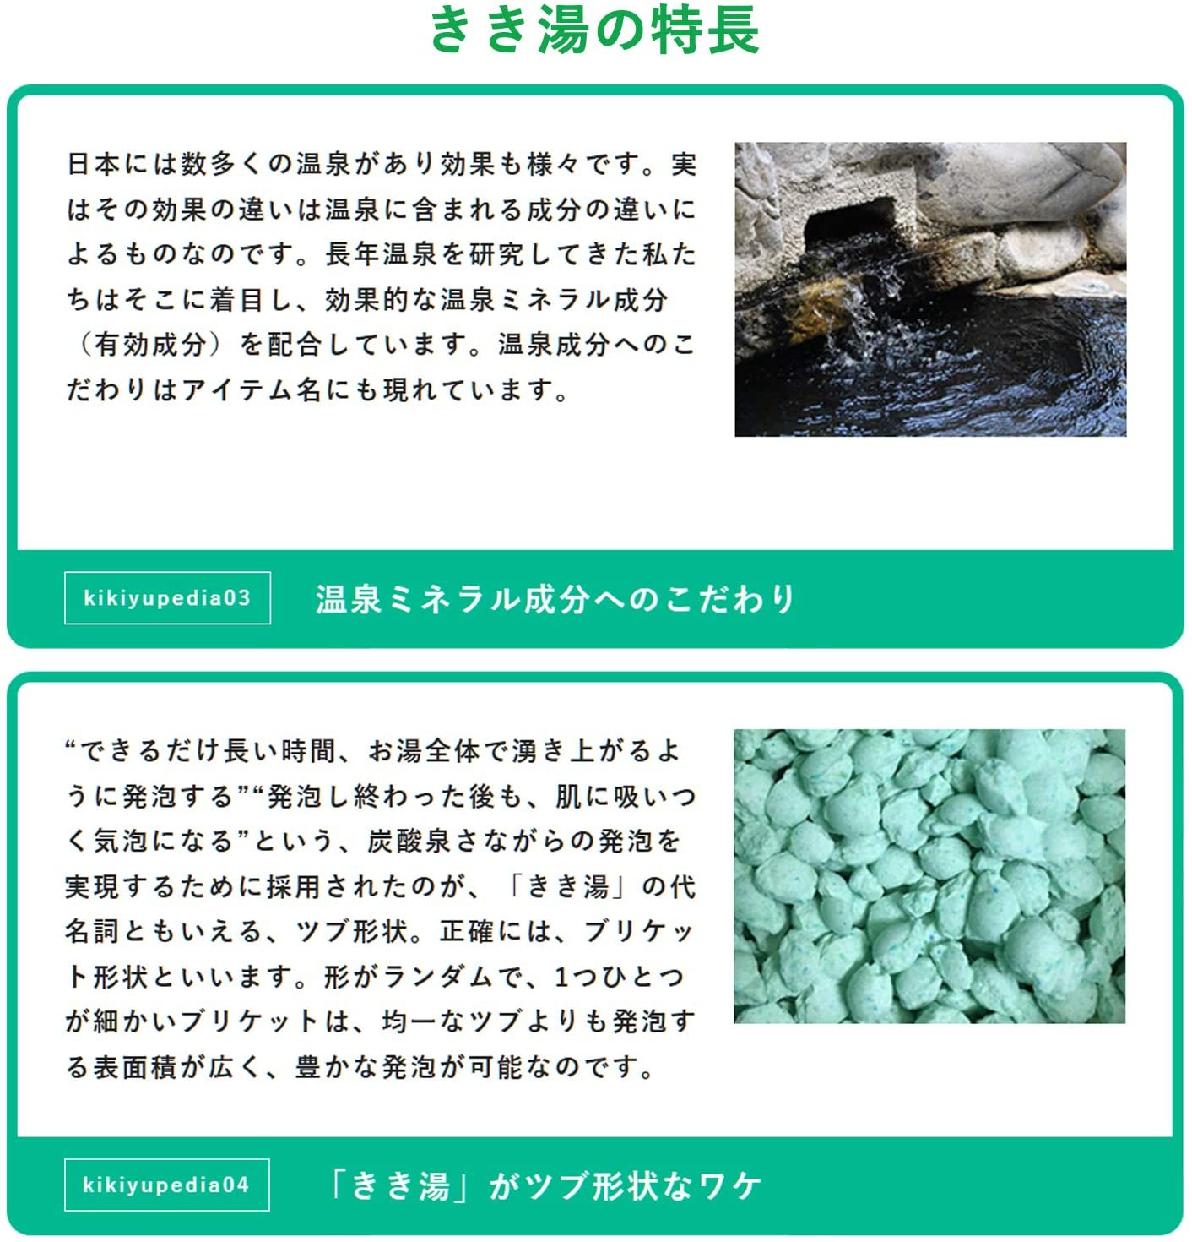 BATHCLIN(バスクリン) きき湯 マグネシウム炭酸湯の商品画像5